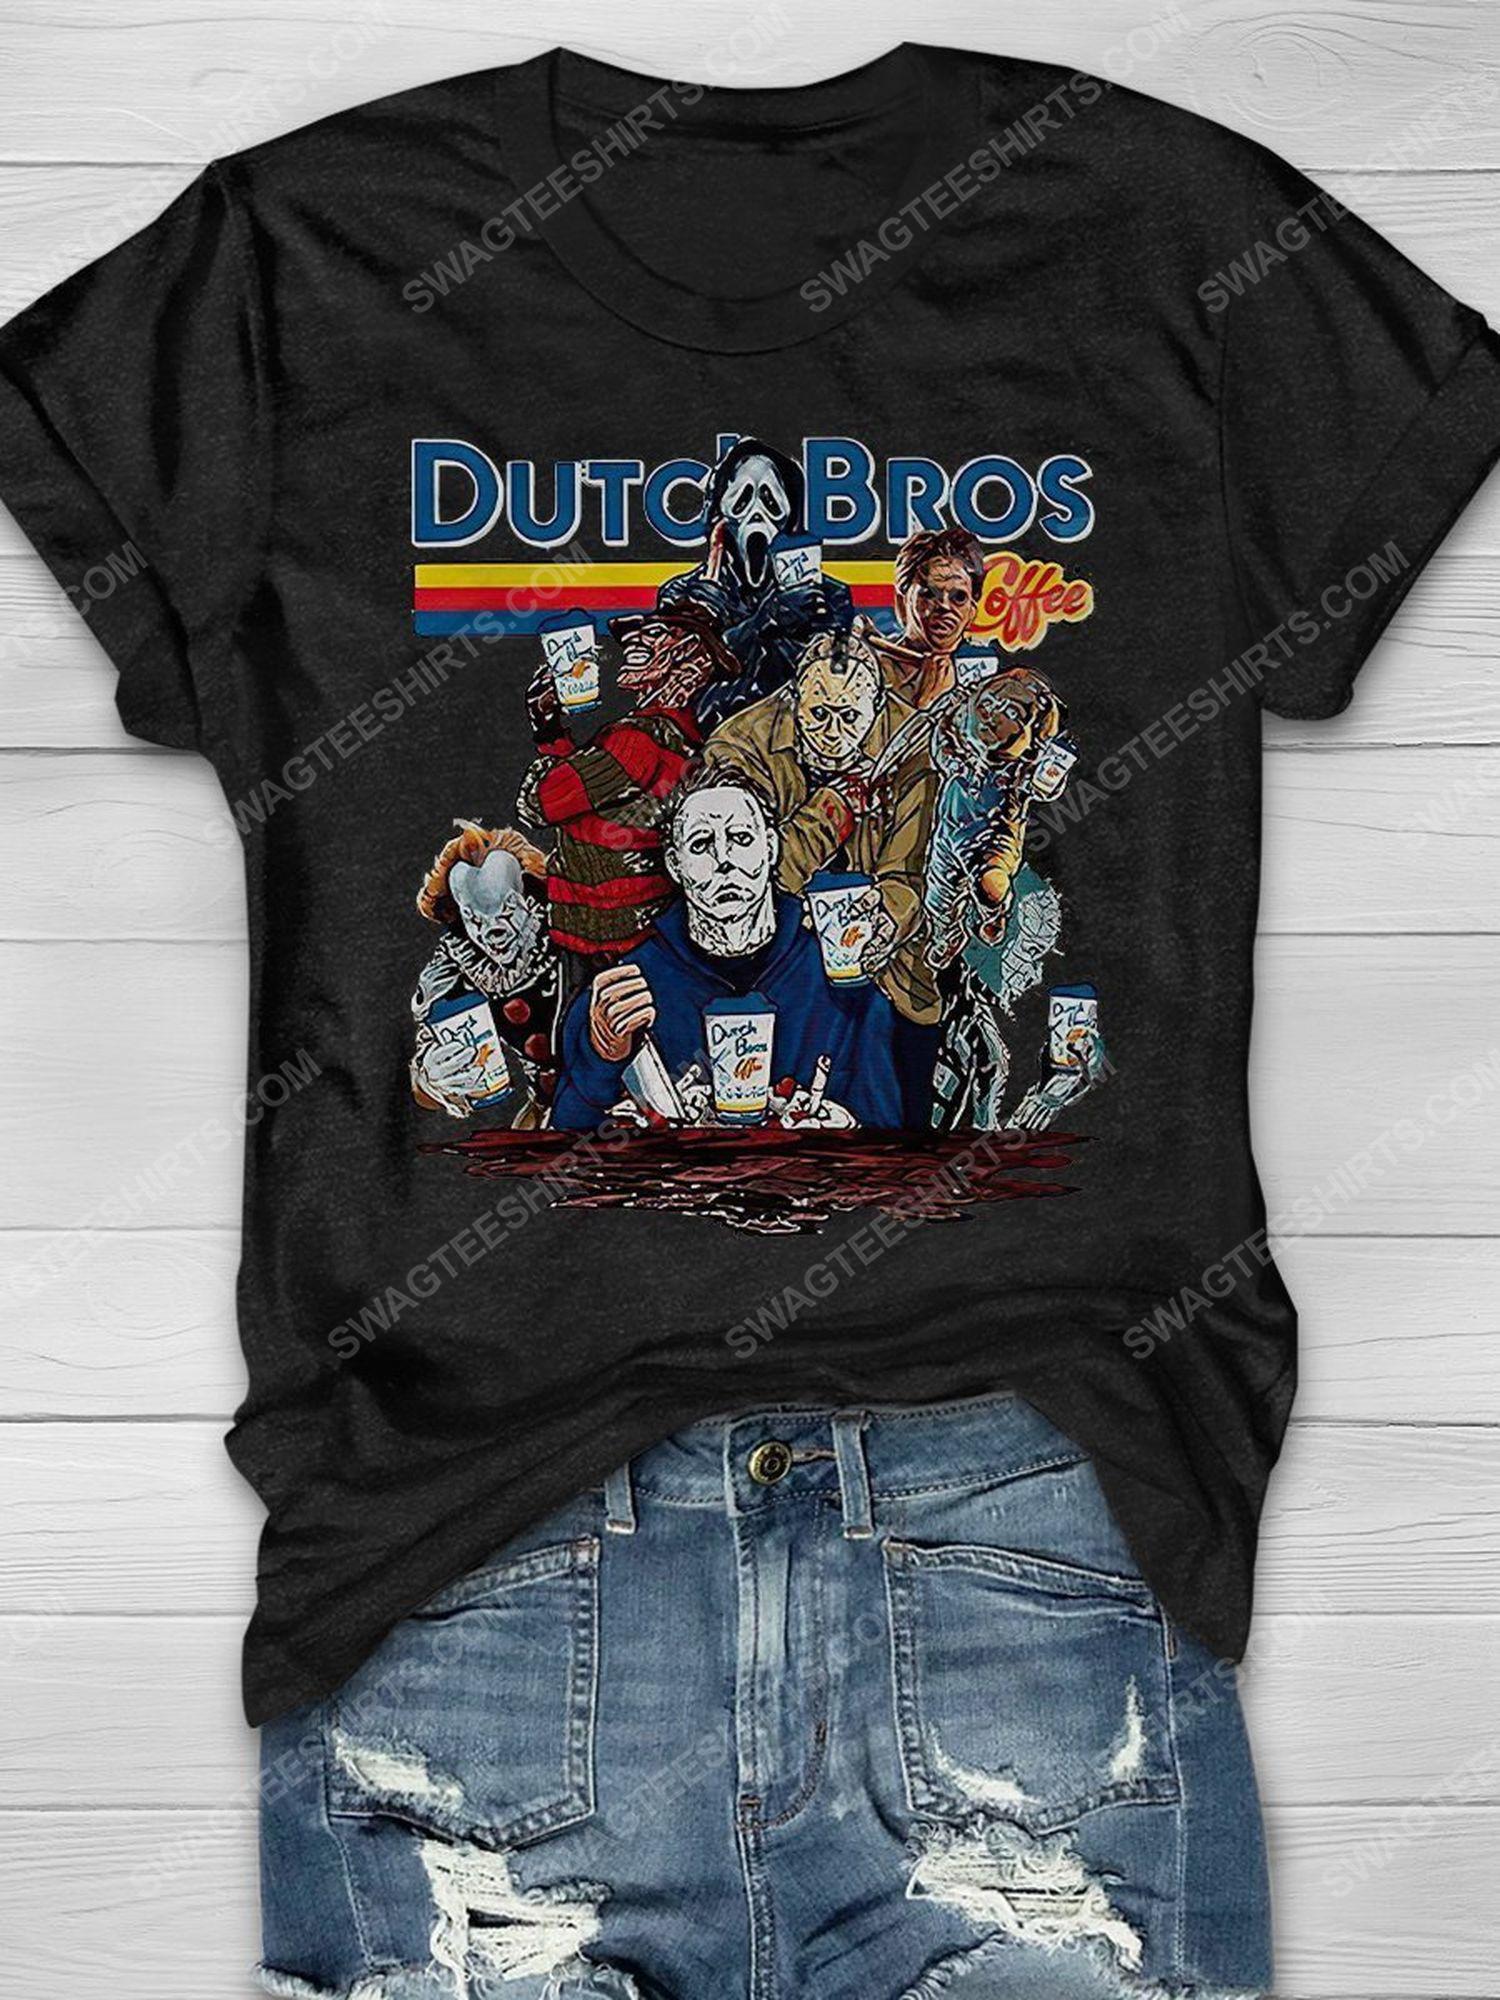 Halloween night dutch bros coffee serial killers shirt 1 - Copy (2)